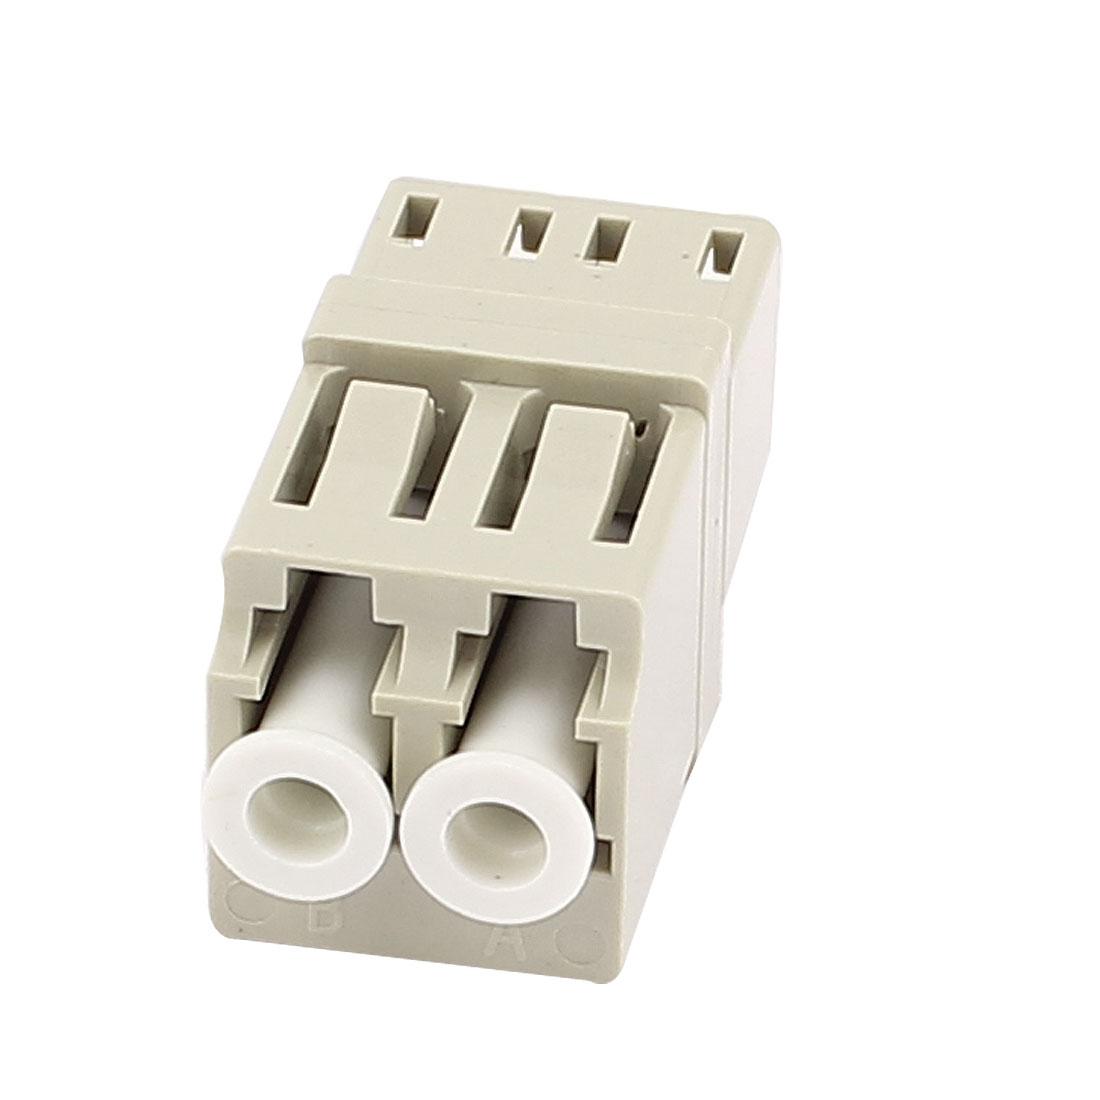 LC-LC Duplex Multimode Optical Duplexer Bare Fiber Optic Adapter